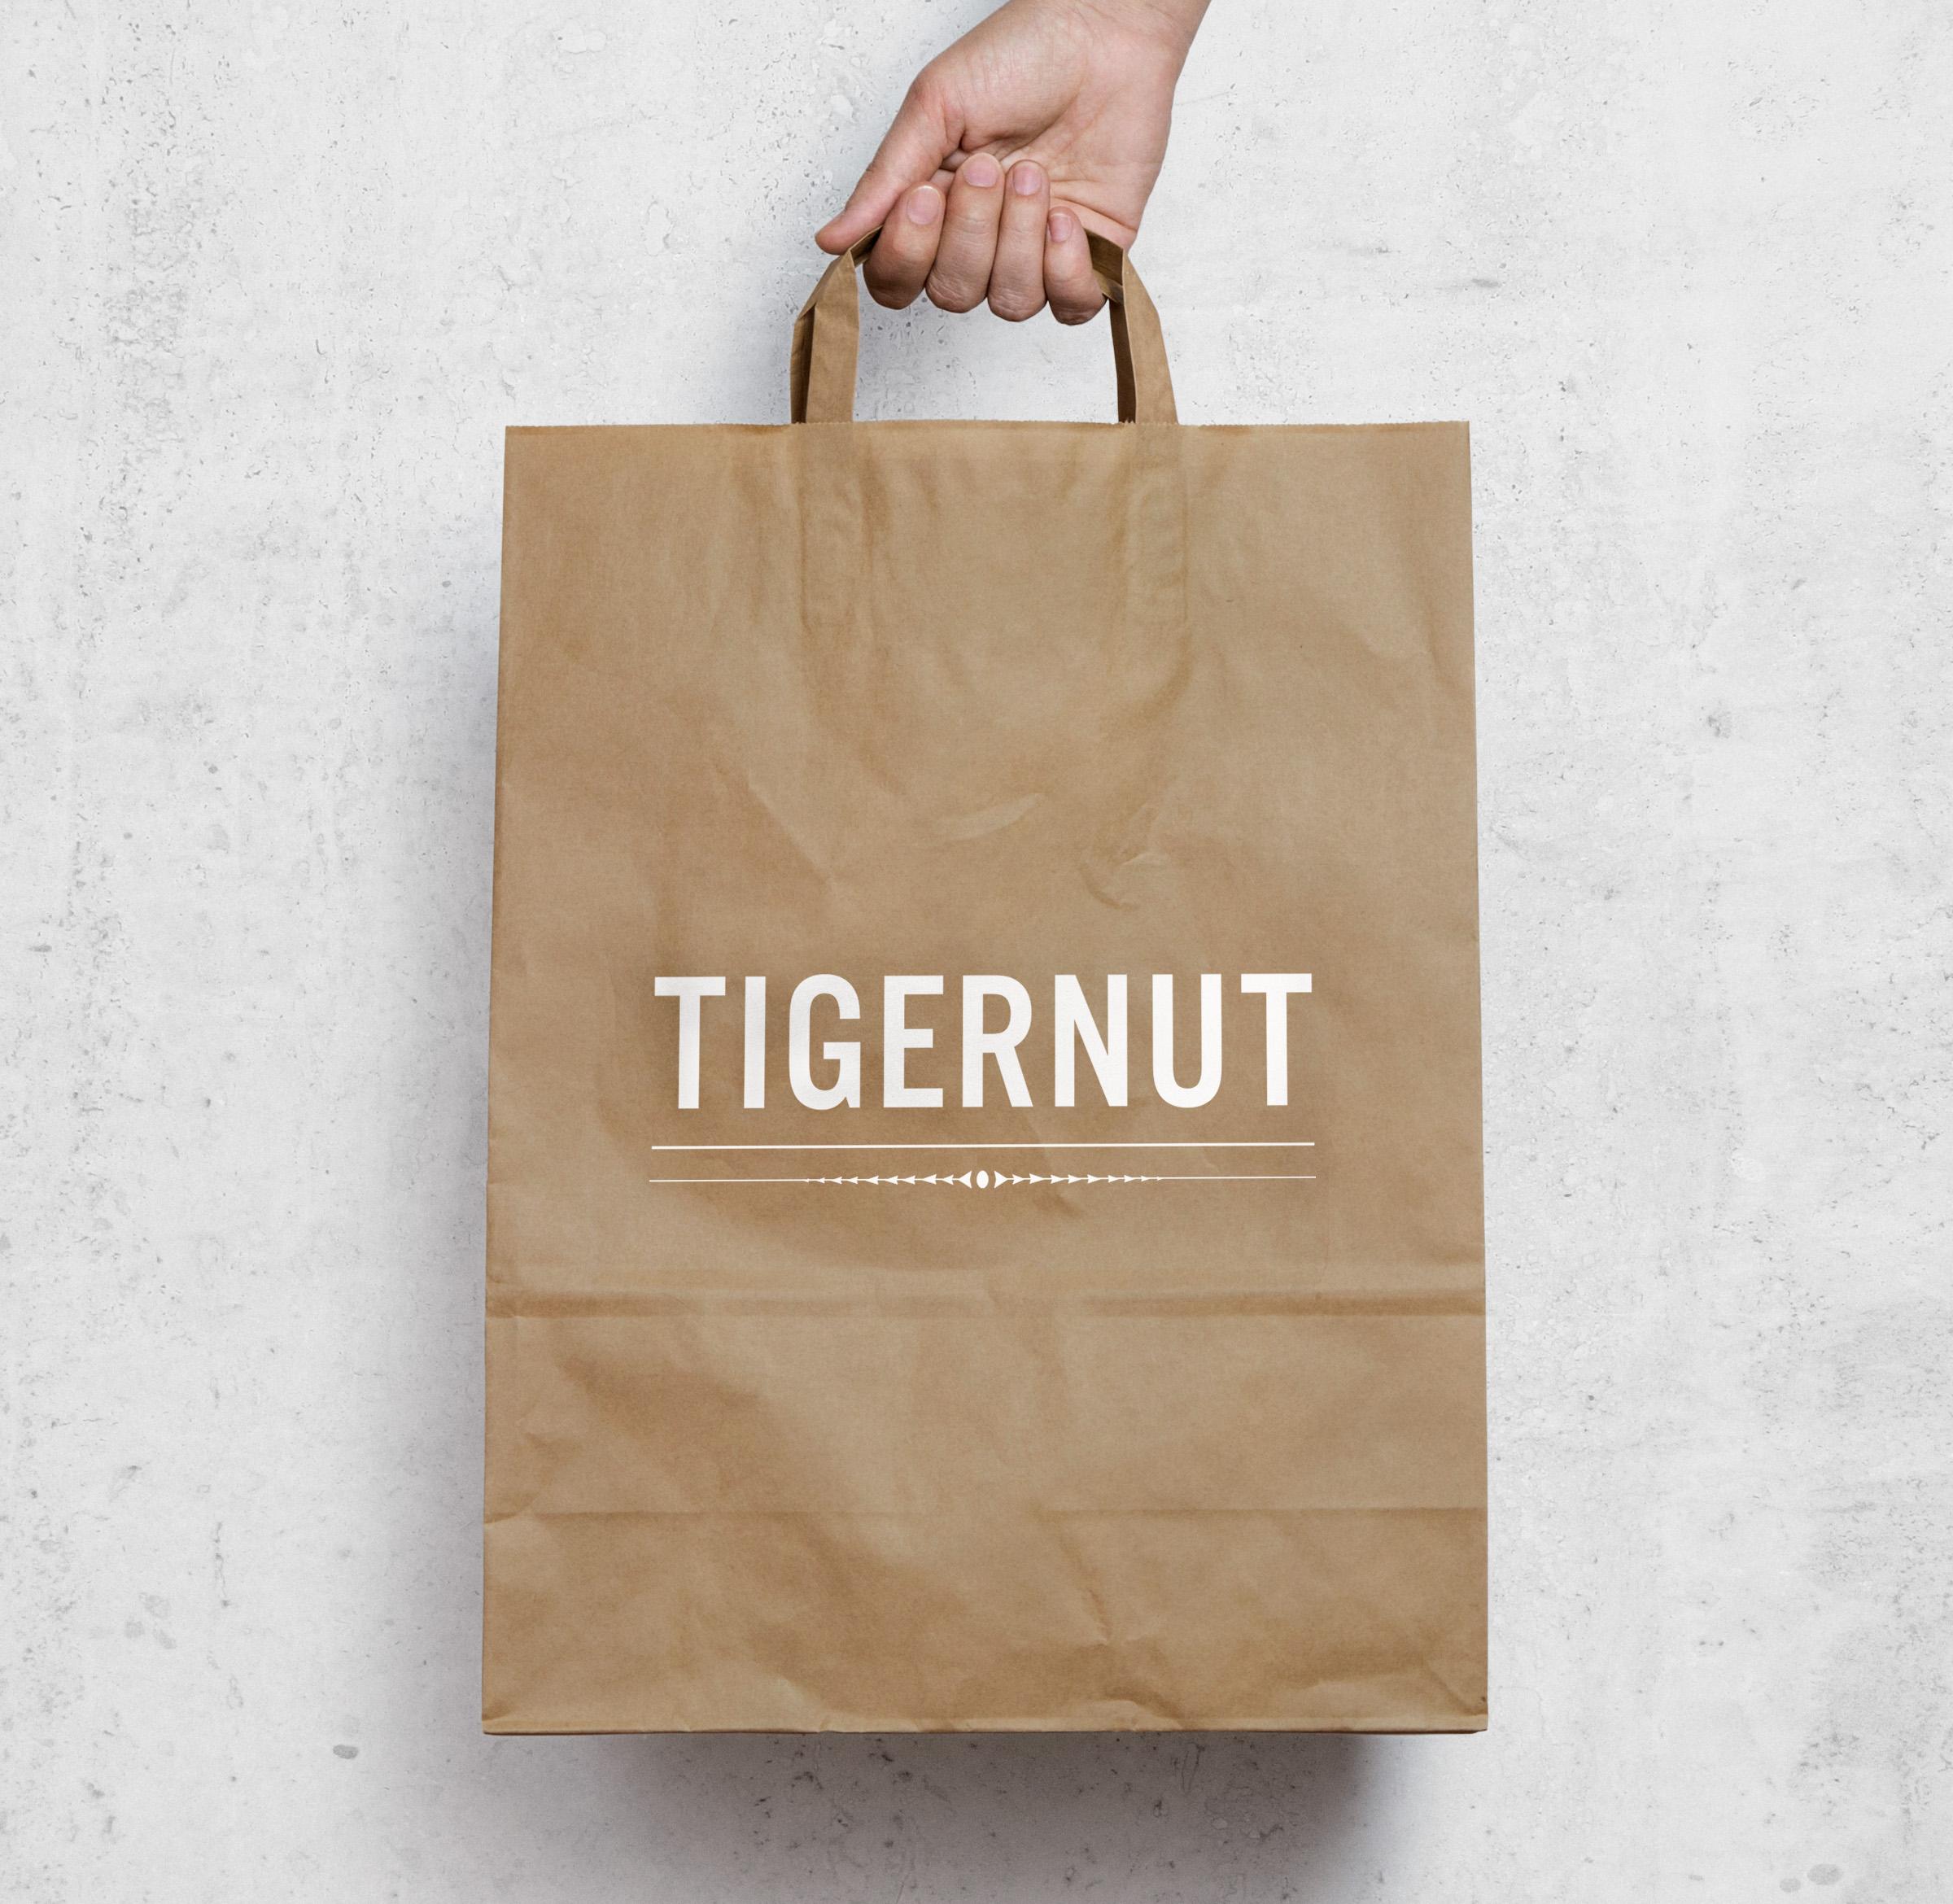 Tignernut-Bag.jpg